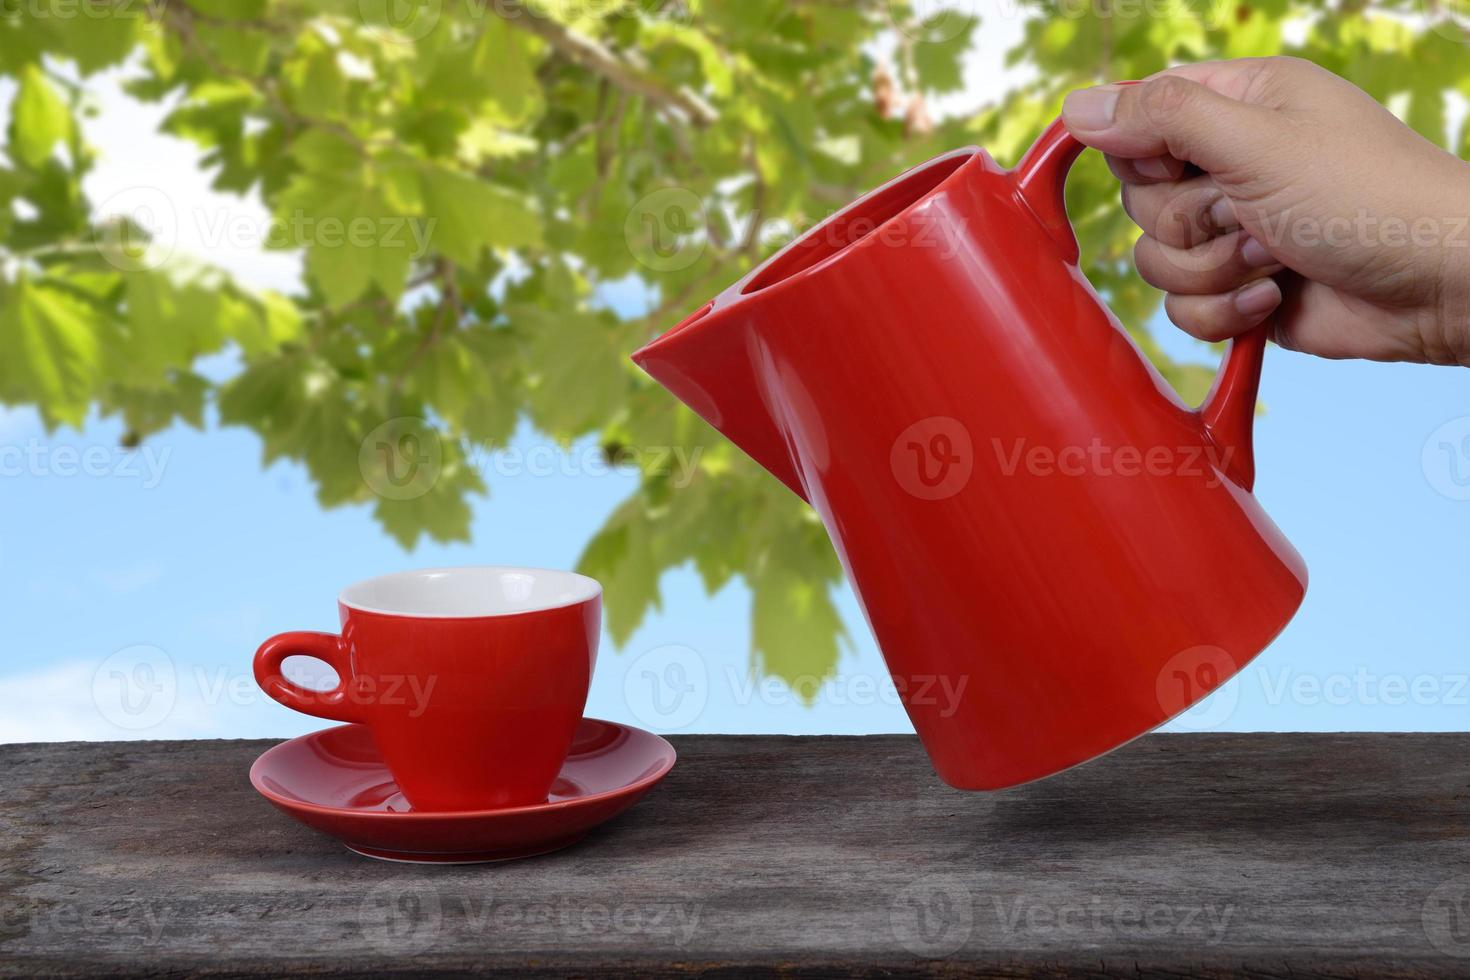 servire bevanda calda. foto